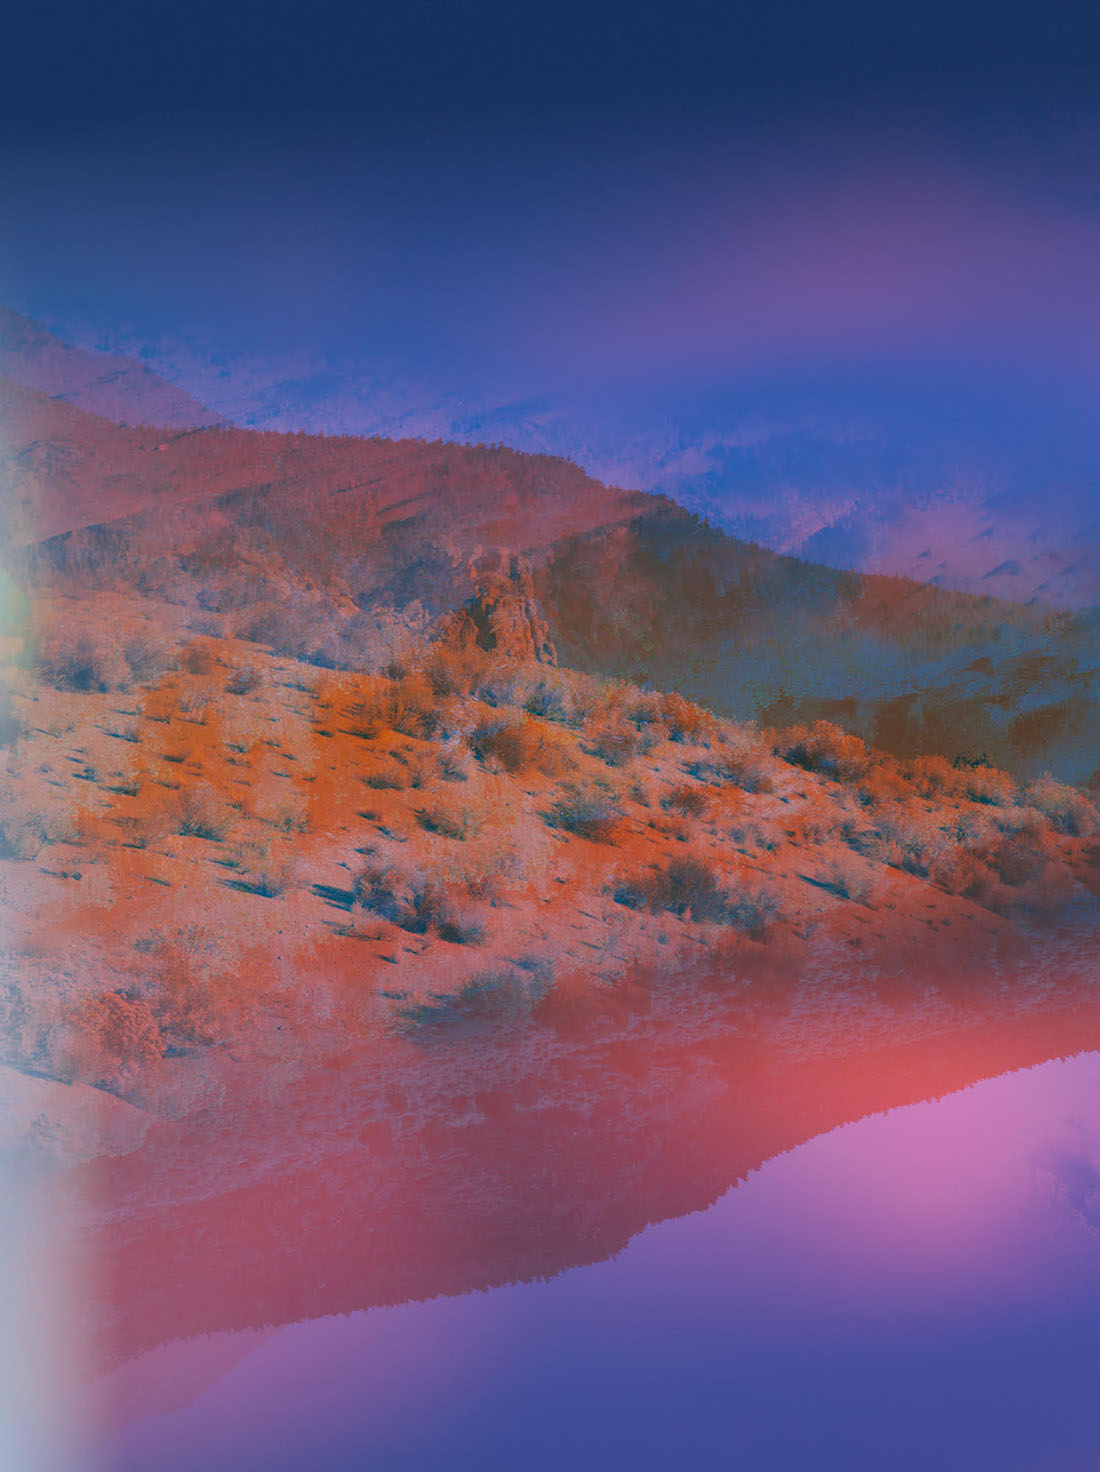 Psychscape 78 (Obsidian Dome, CA), 2017 © Terri Loewenthal